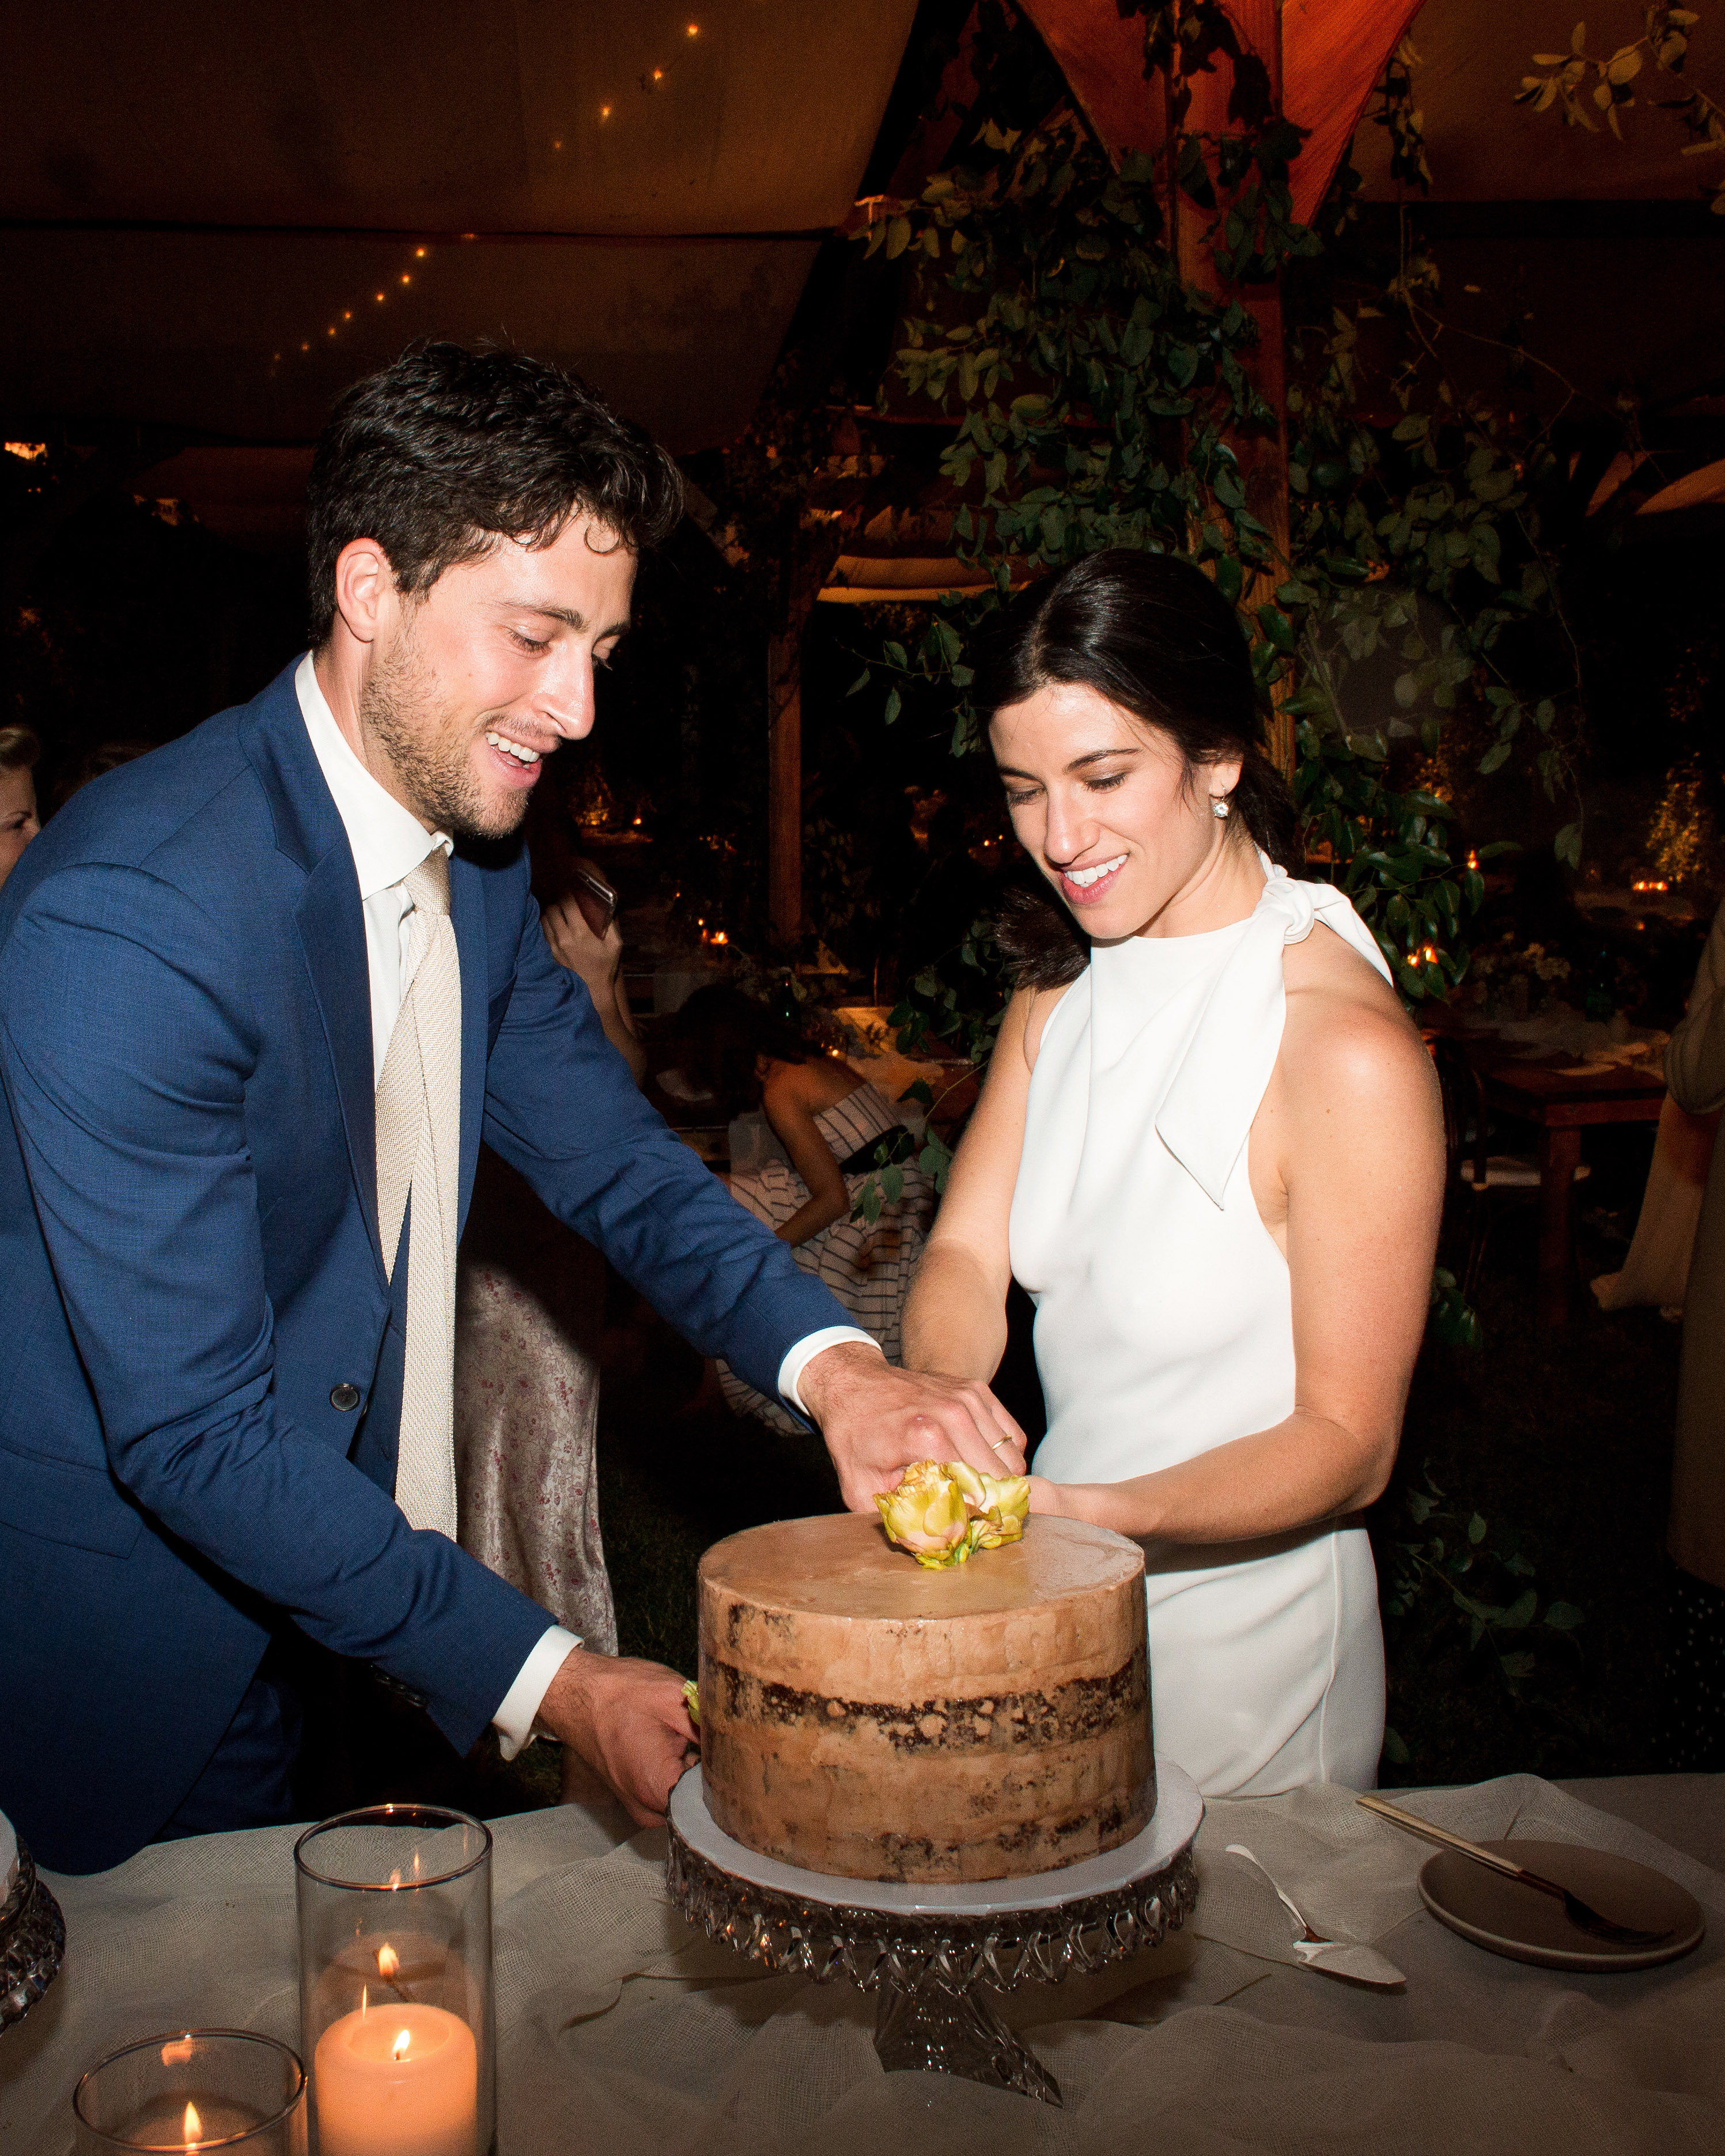 anika max wedding couple cutting cake